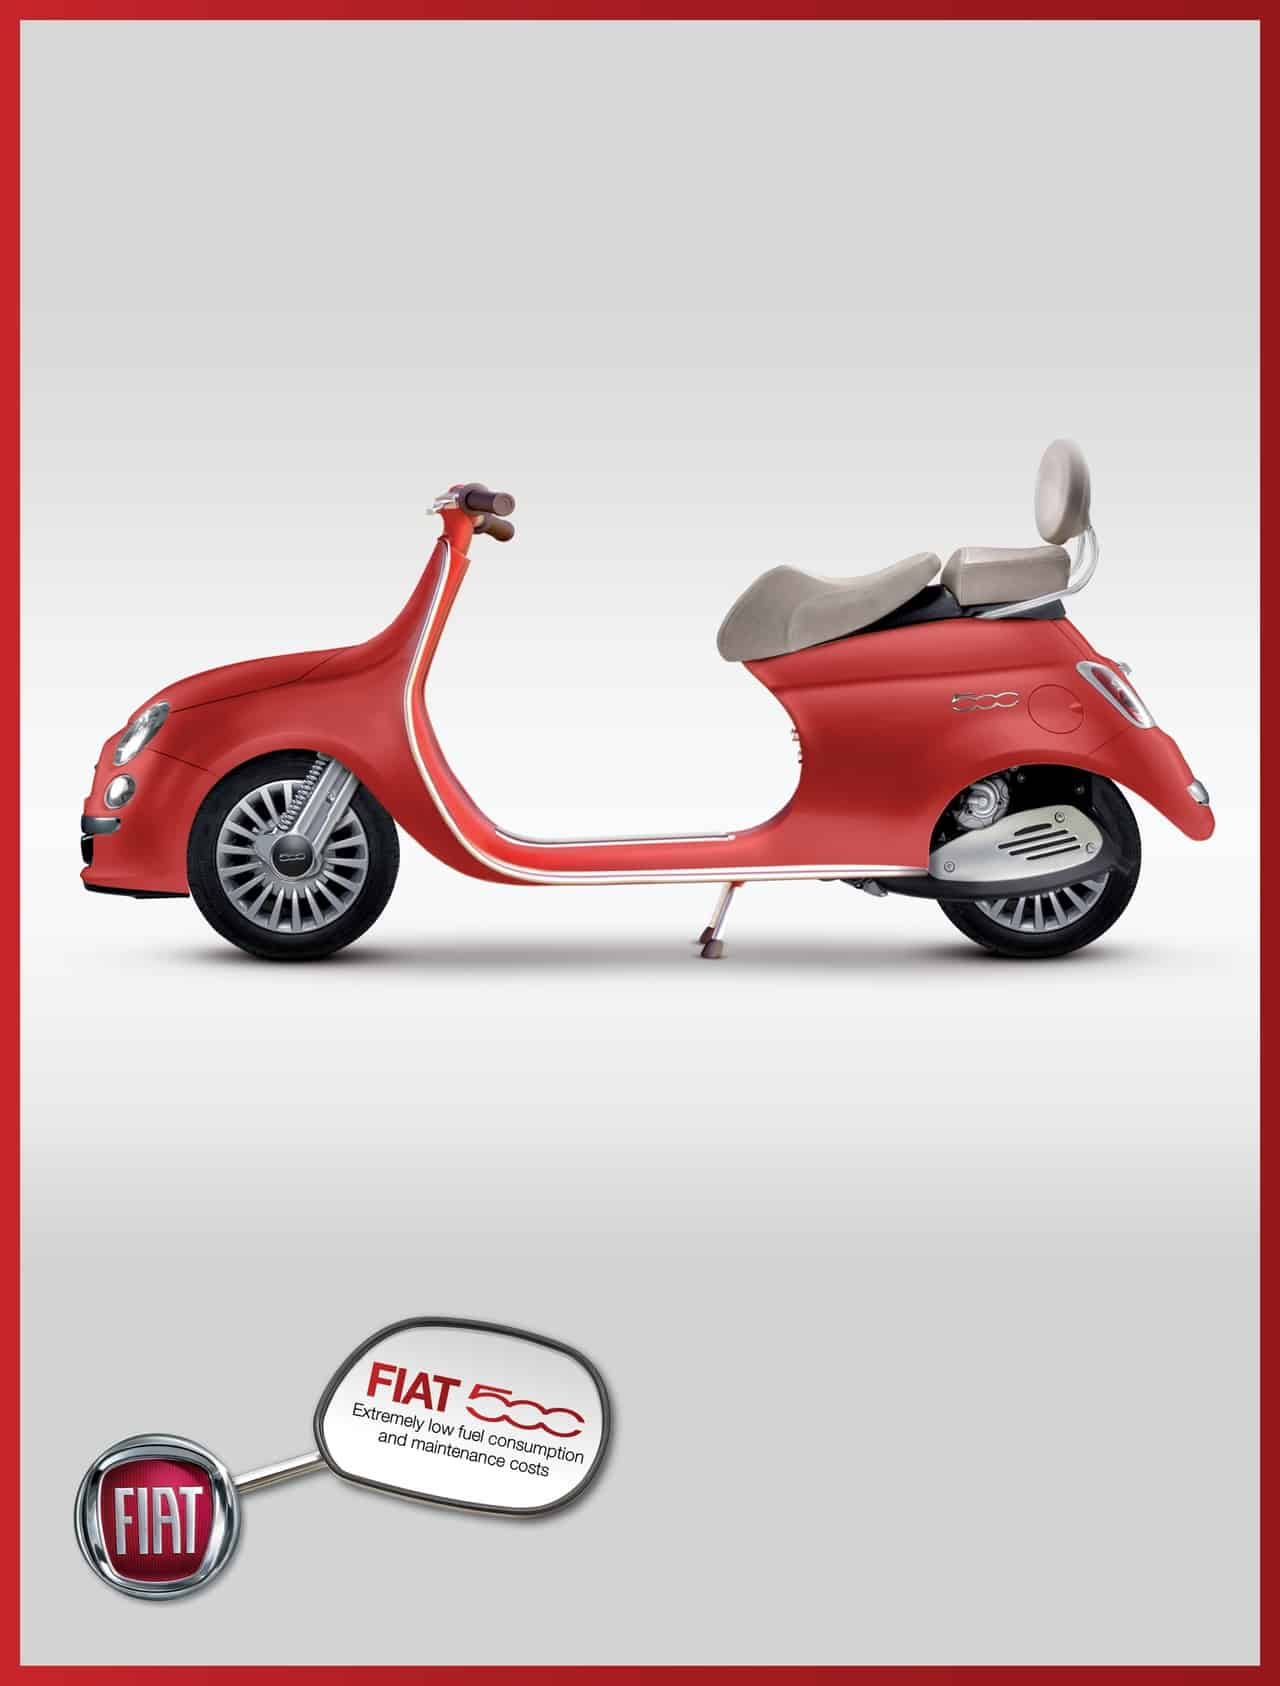 pub fiat le scooter 500. Black Bedroom Furniture Sets. Home Design Ideas